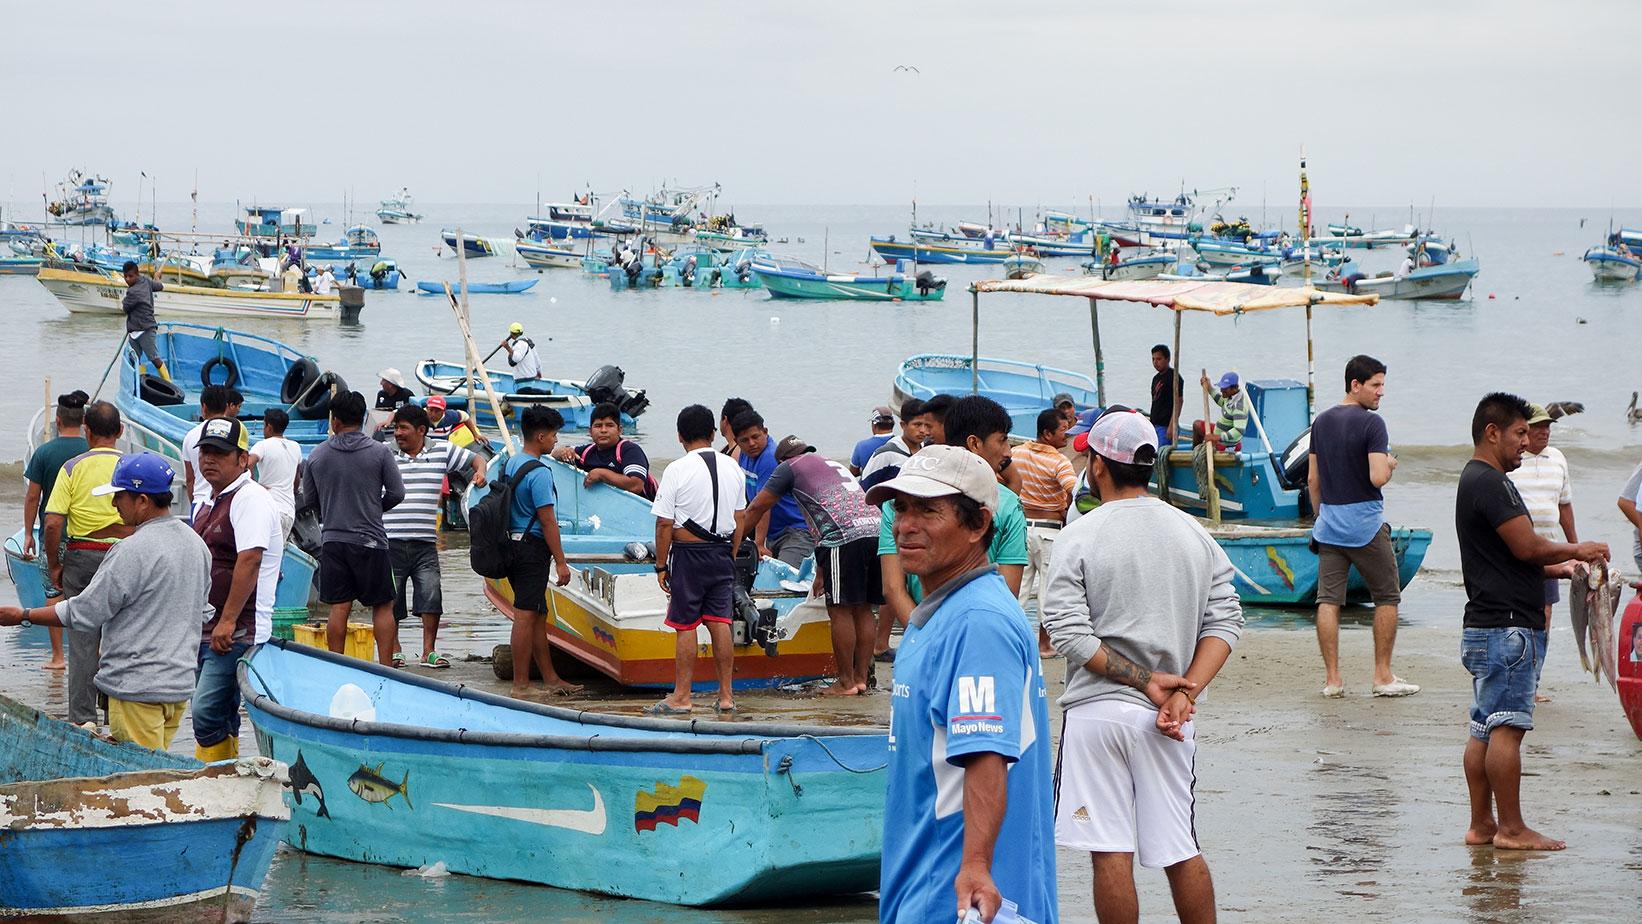 The Fishing Fleet Arrives